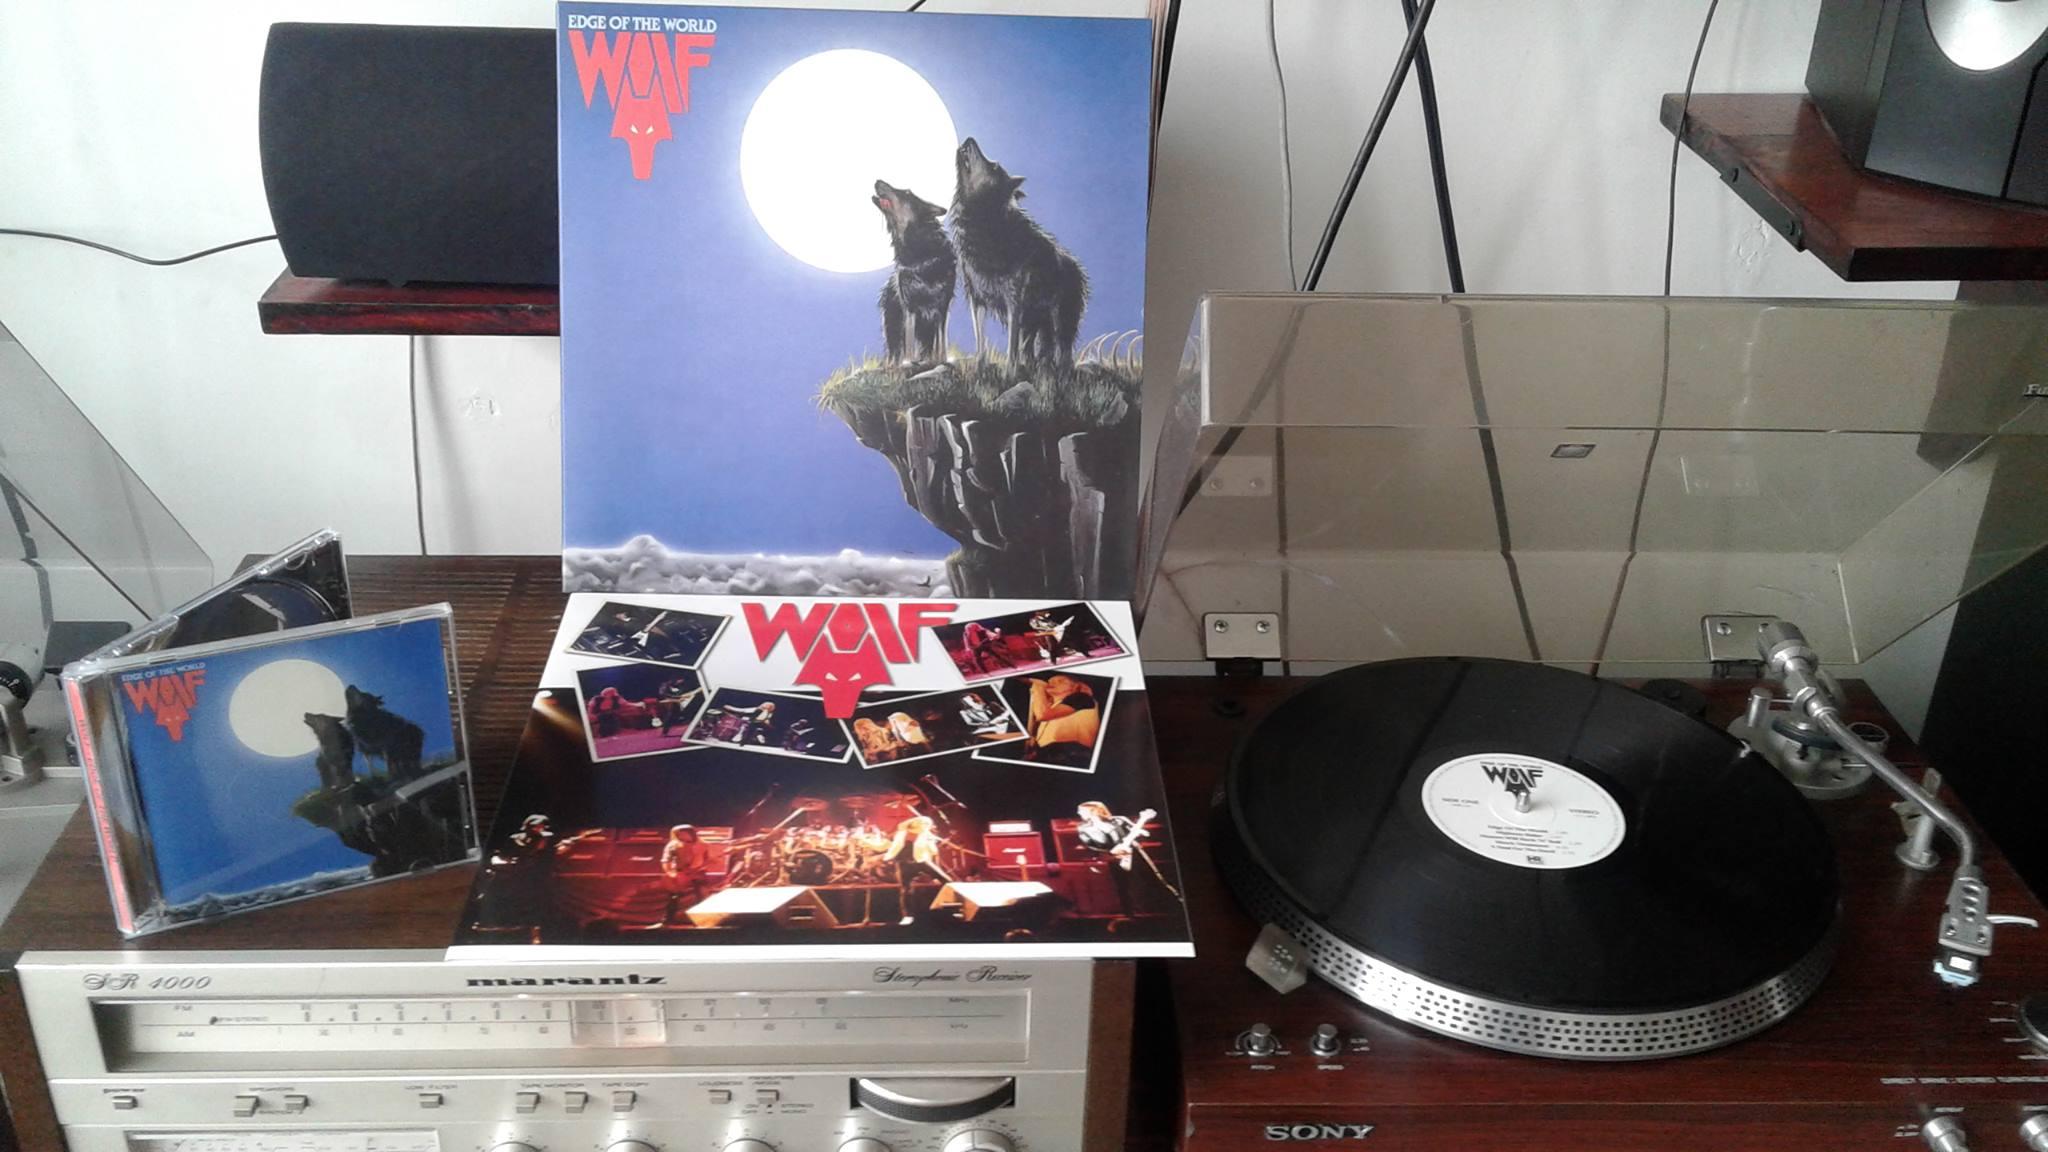 WOLF Edge Of The World (1982) NWOBHM / Heavy Metal 22538910